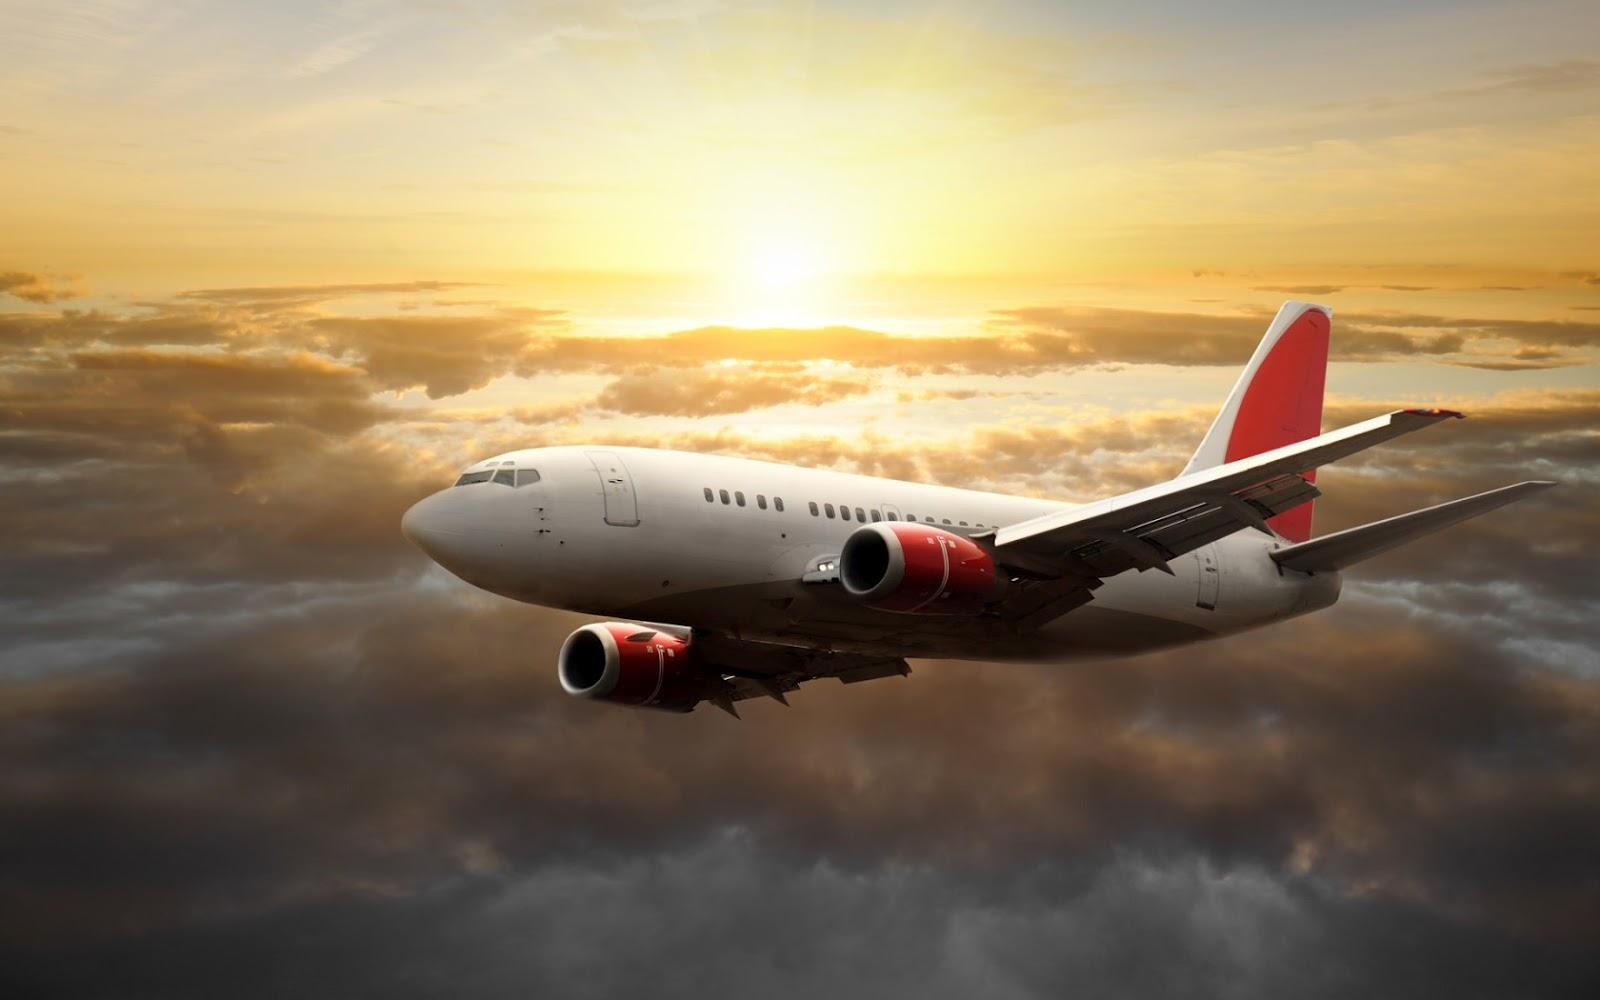 avion comercial volando